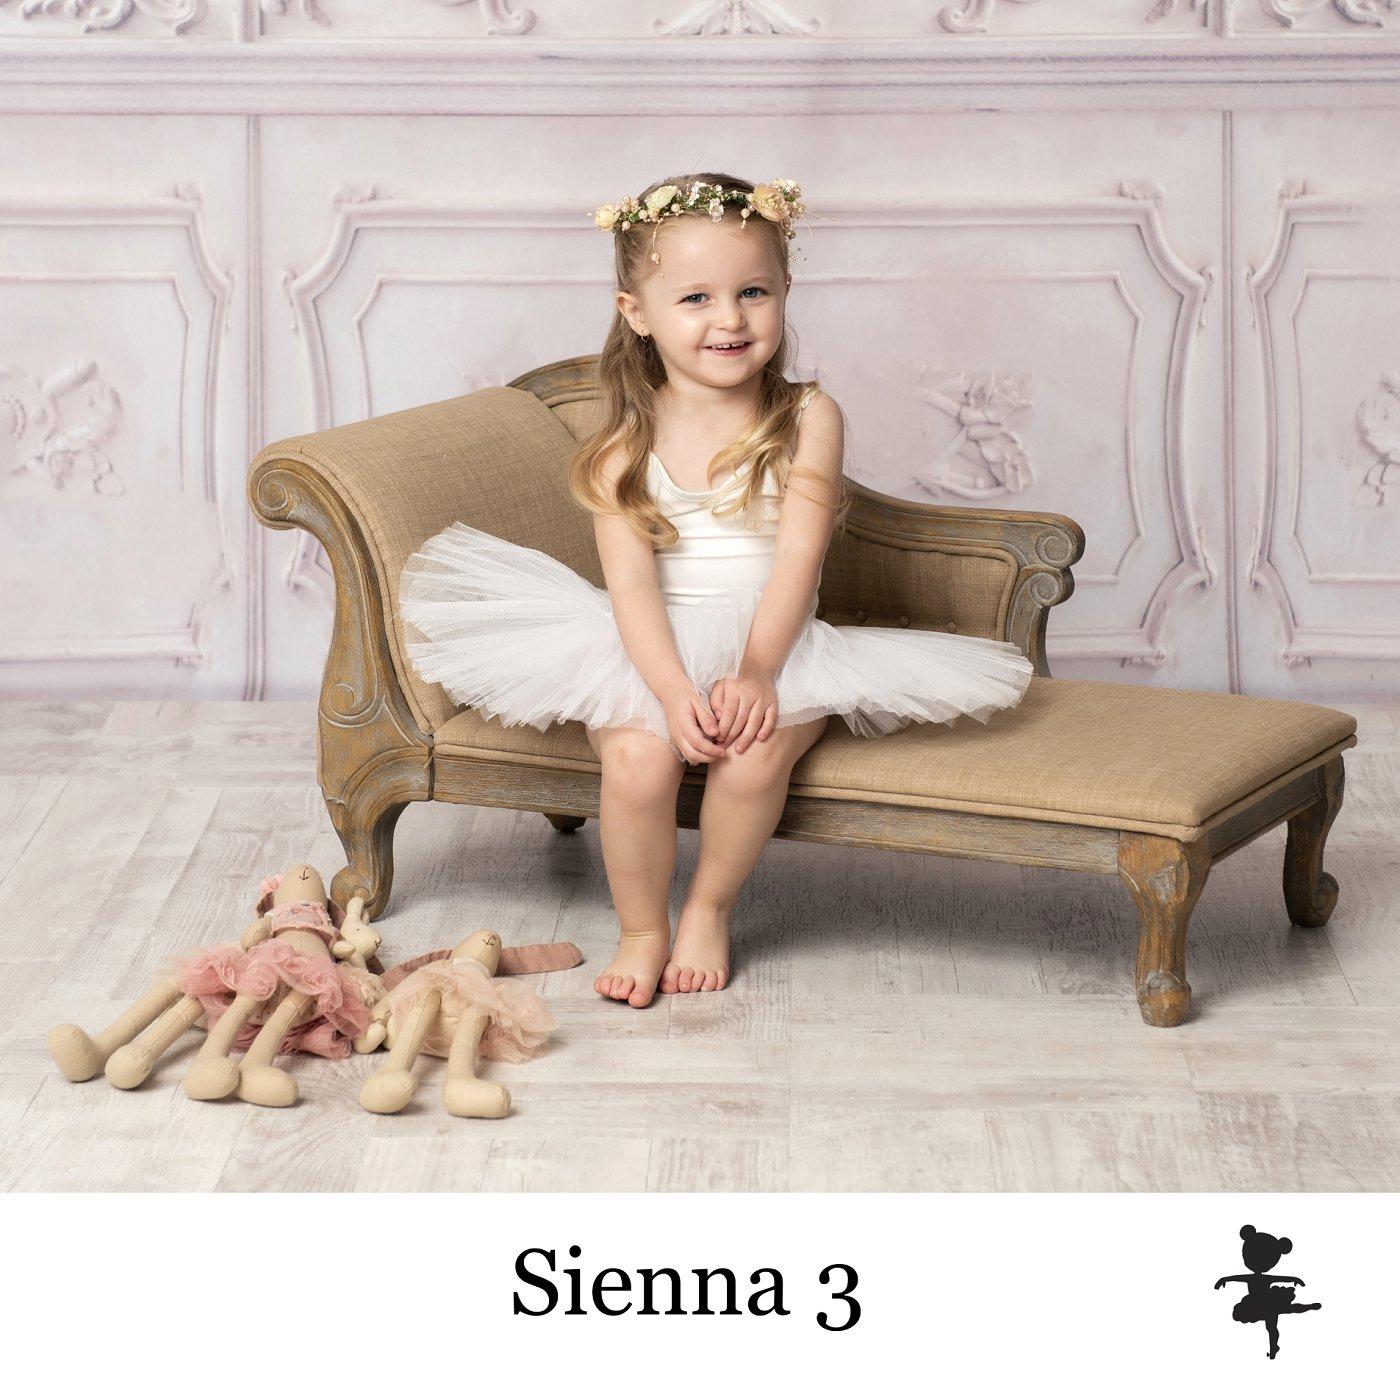 LB10919-Sienna 3.jpg